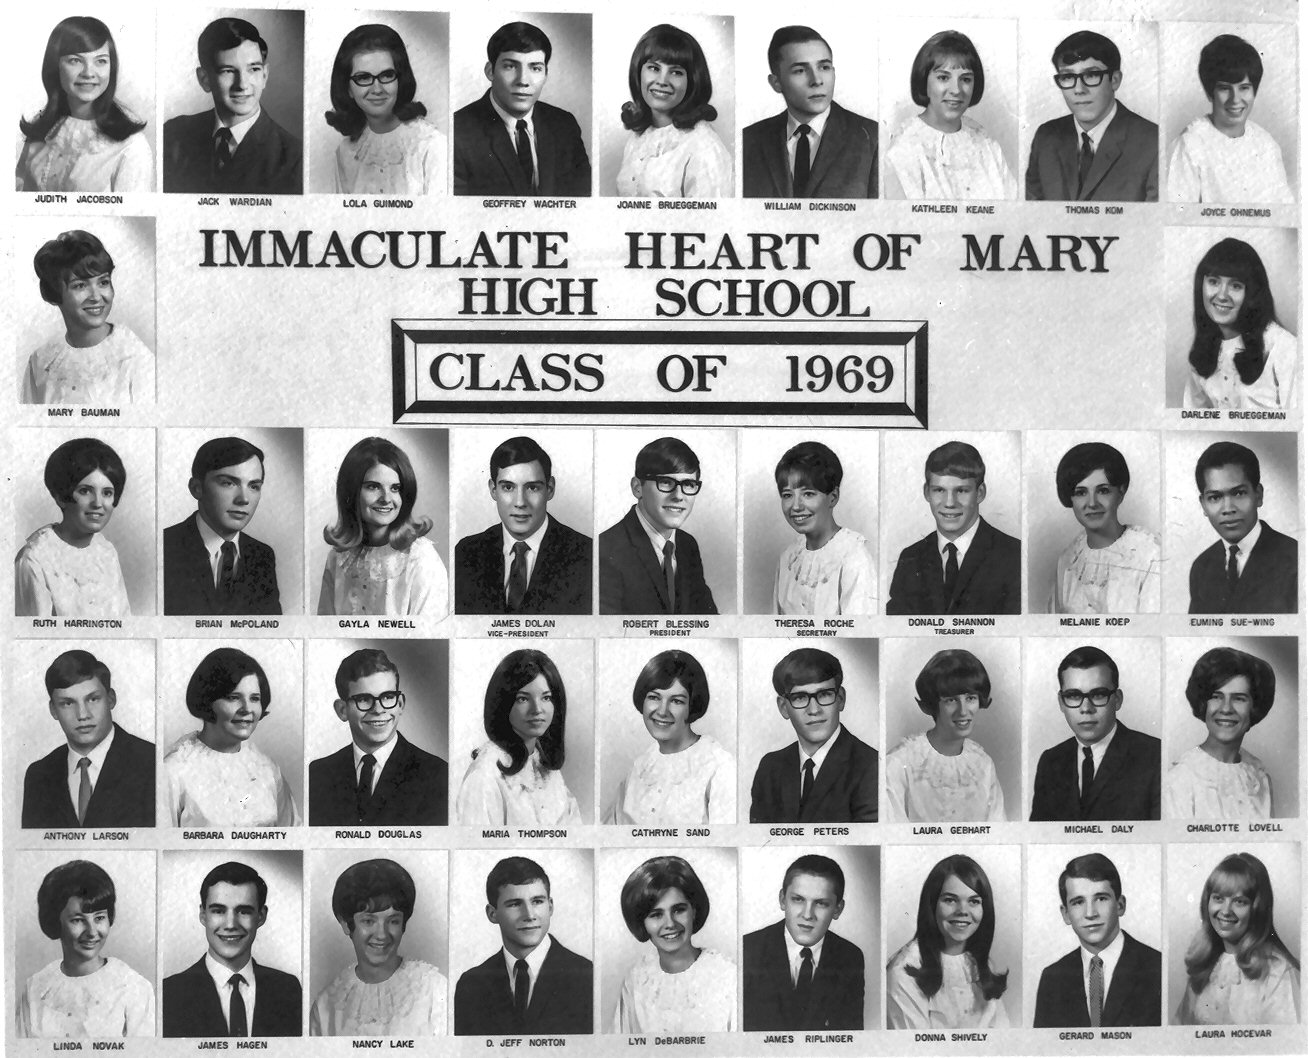 ihm alumni class of 1969